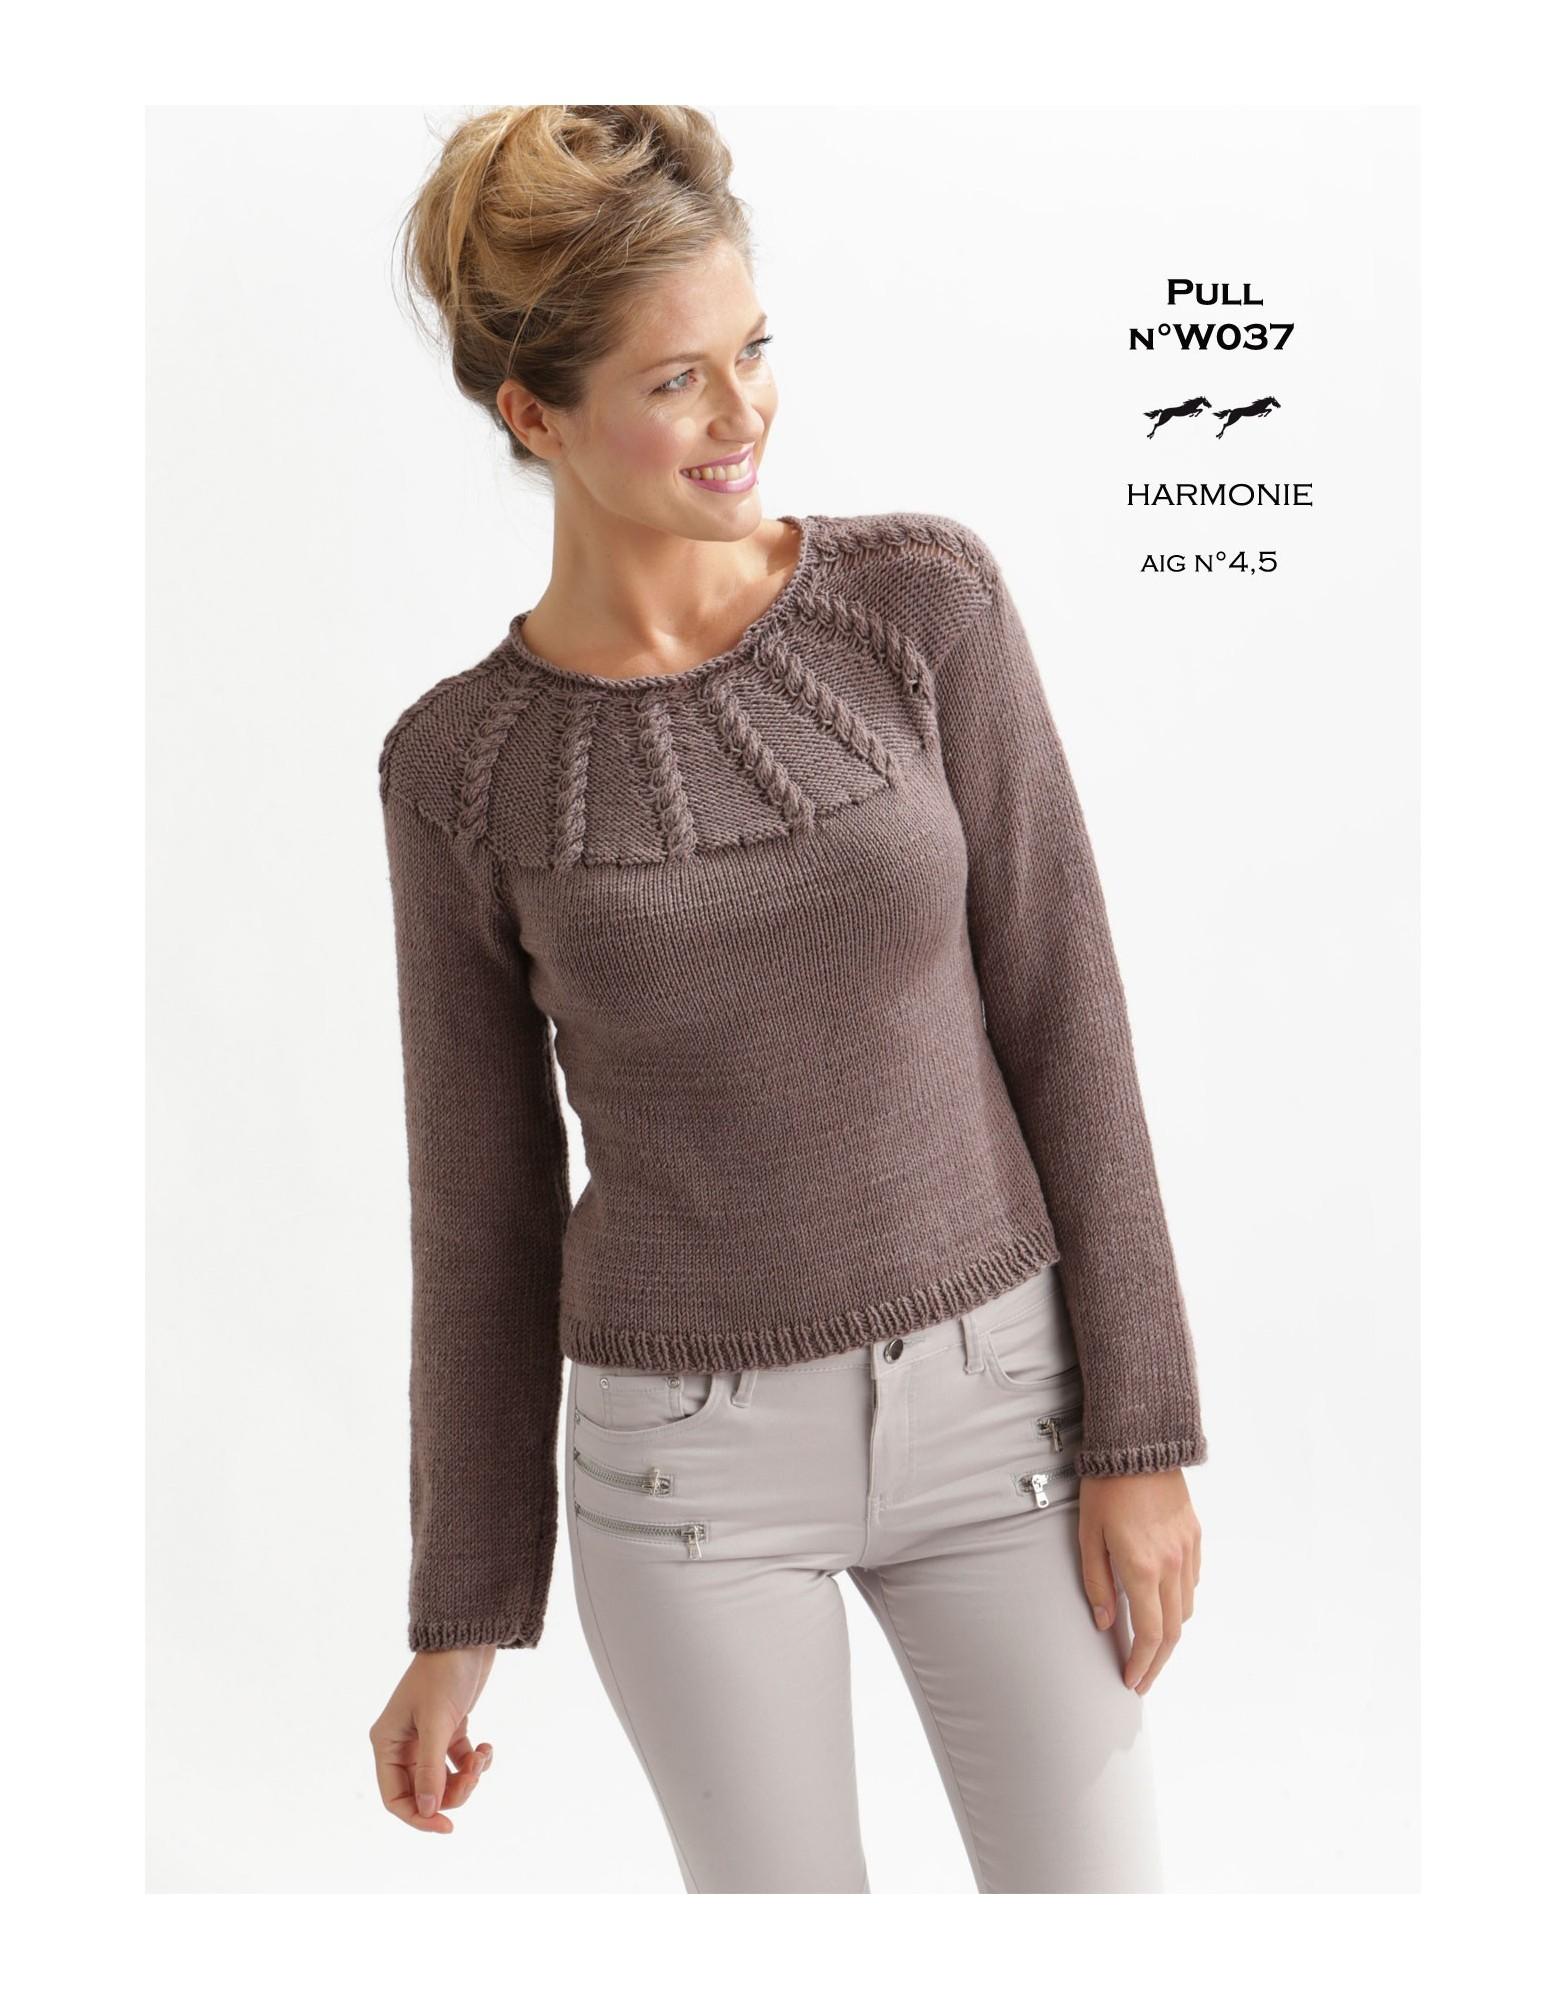 modele de tricotage gratuit